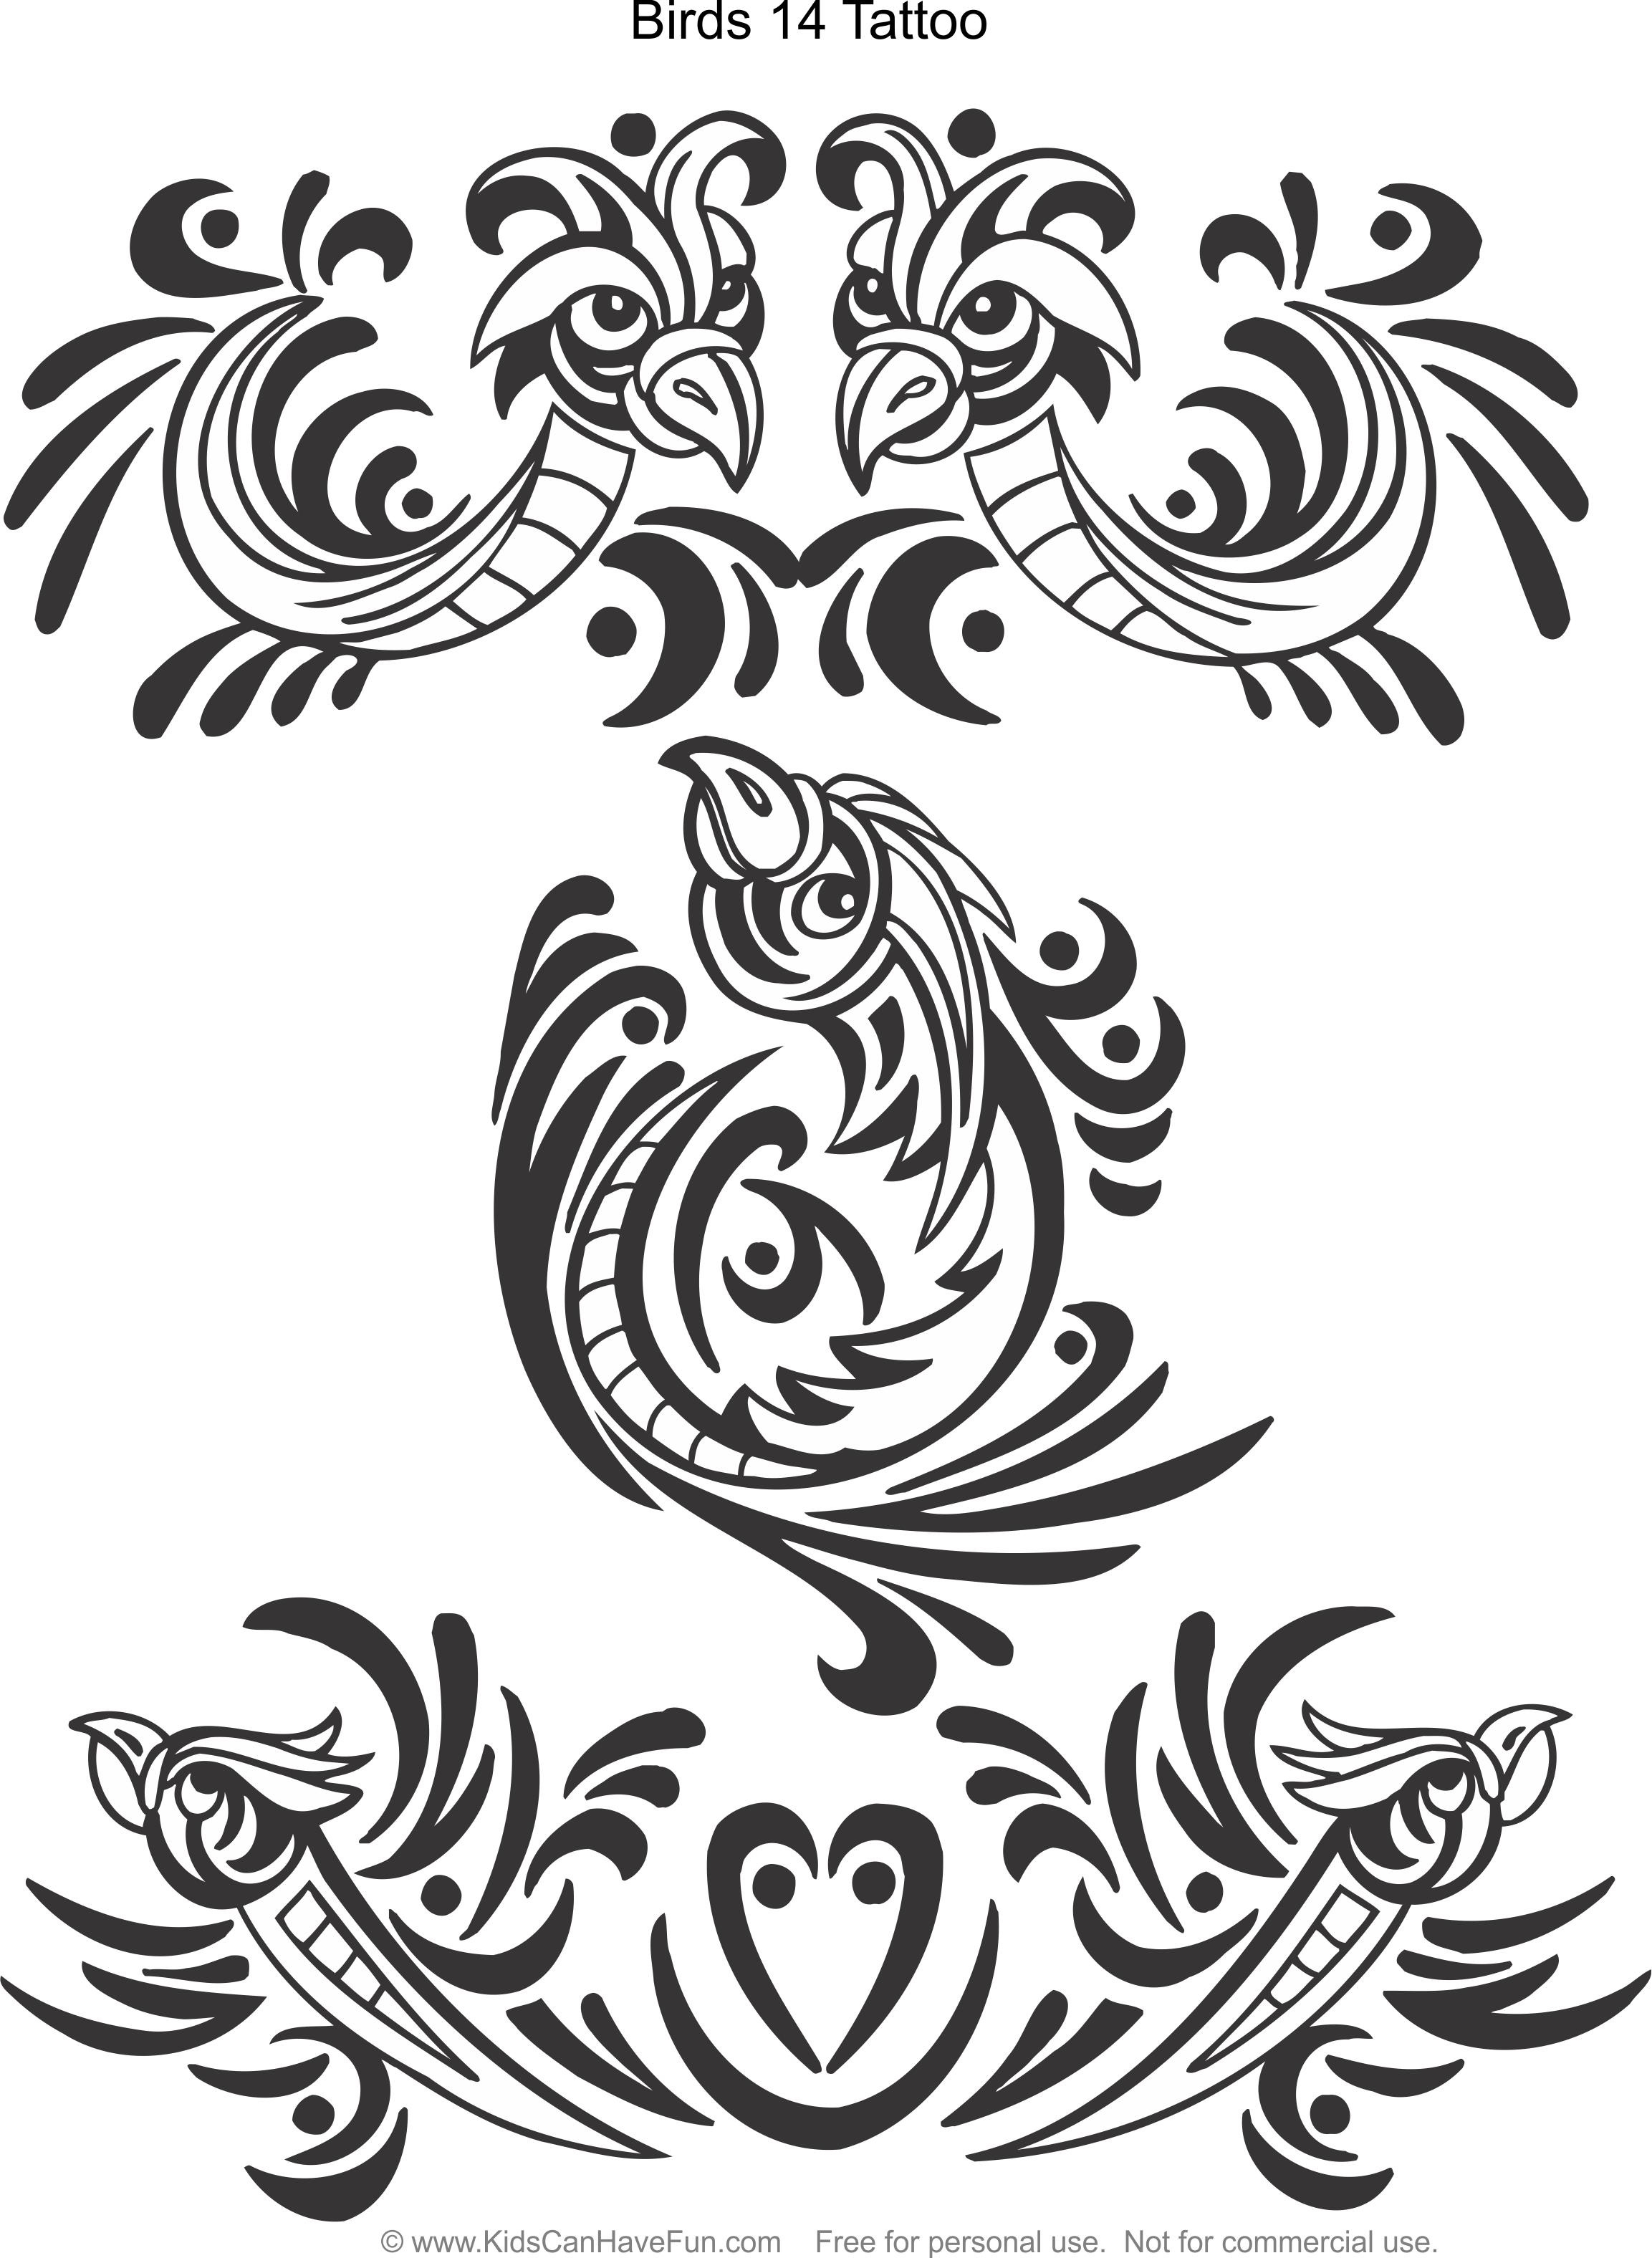 Tattoo designs coloring book - Birds 14 Tattoo Design Coloring Page Http Www Kidscanhavefun Com